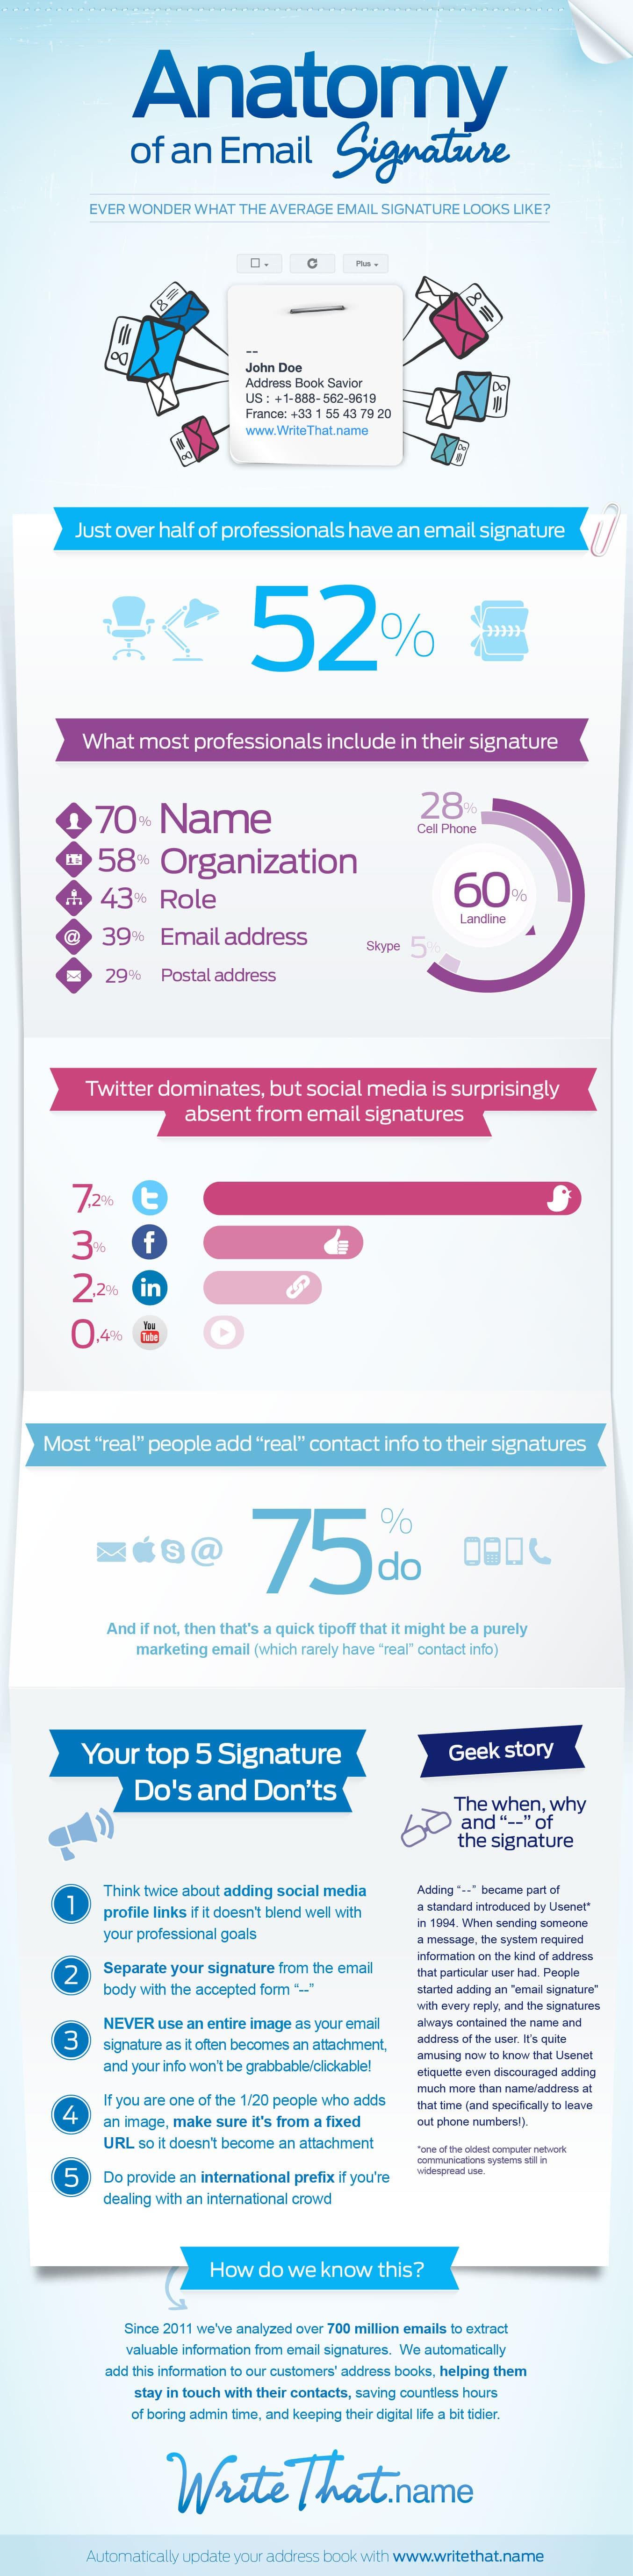 anatomy-professional-email-signature-infographic